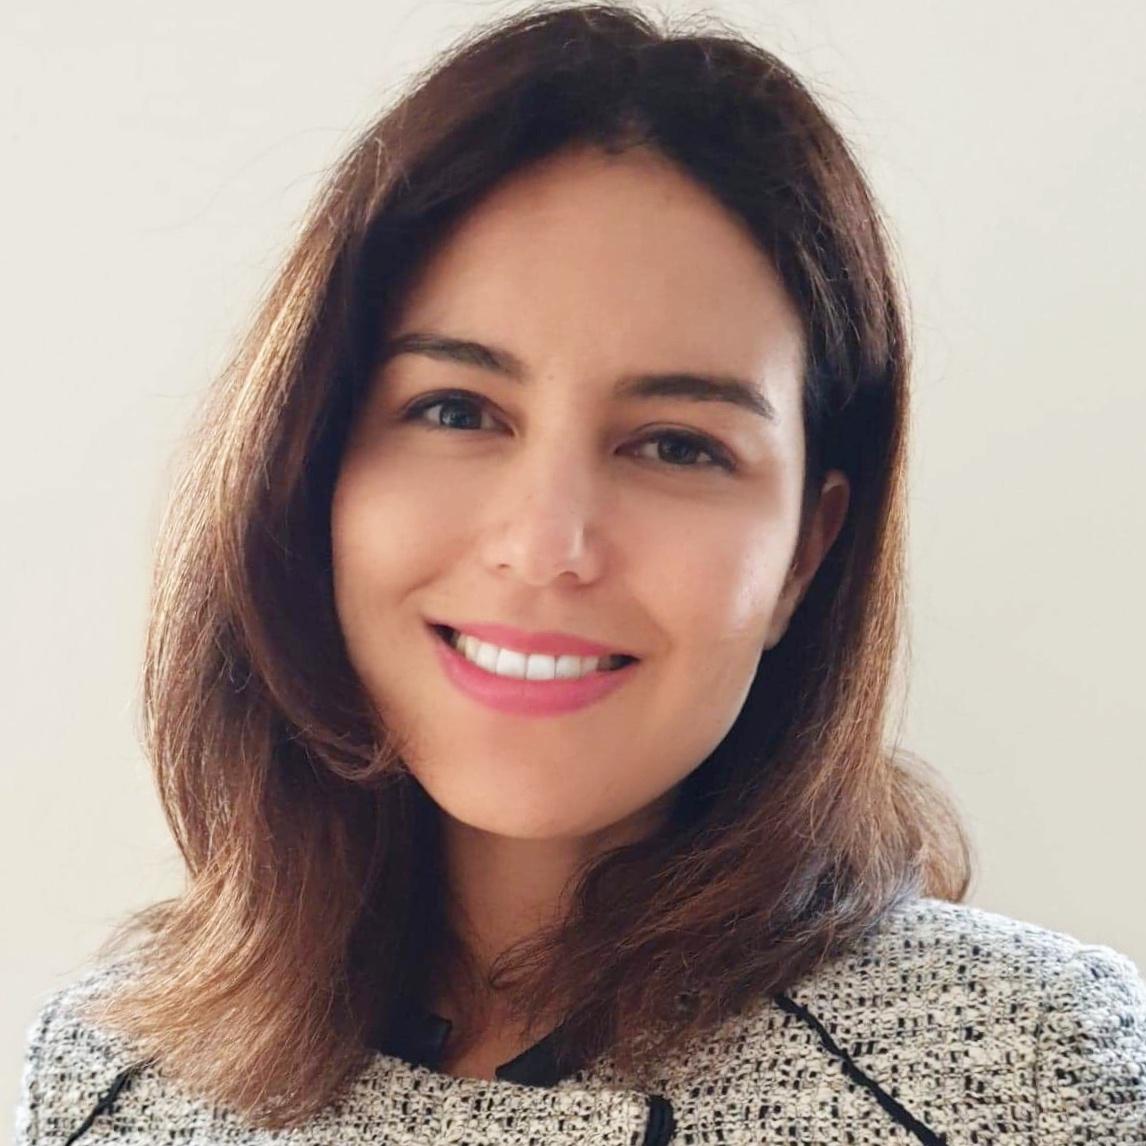 Raiha Buchanan - Podcast co-host and CEO